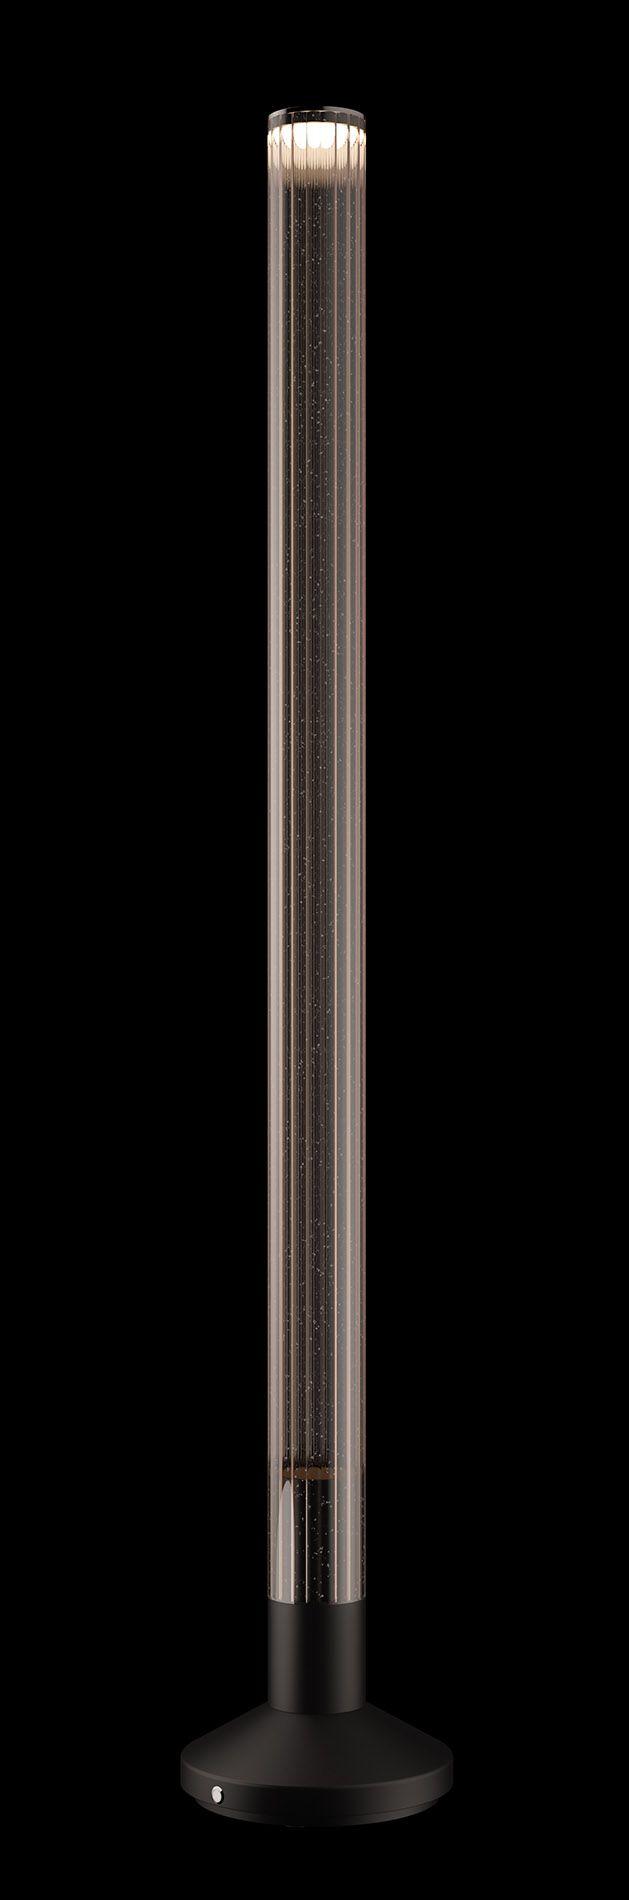 Monolicht - Brochure 1095